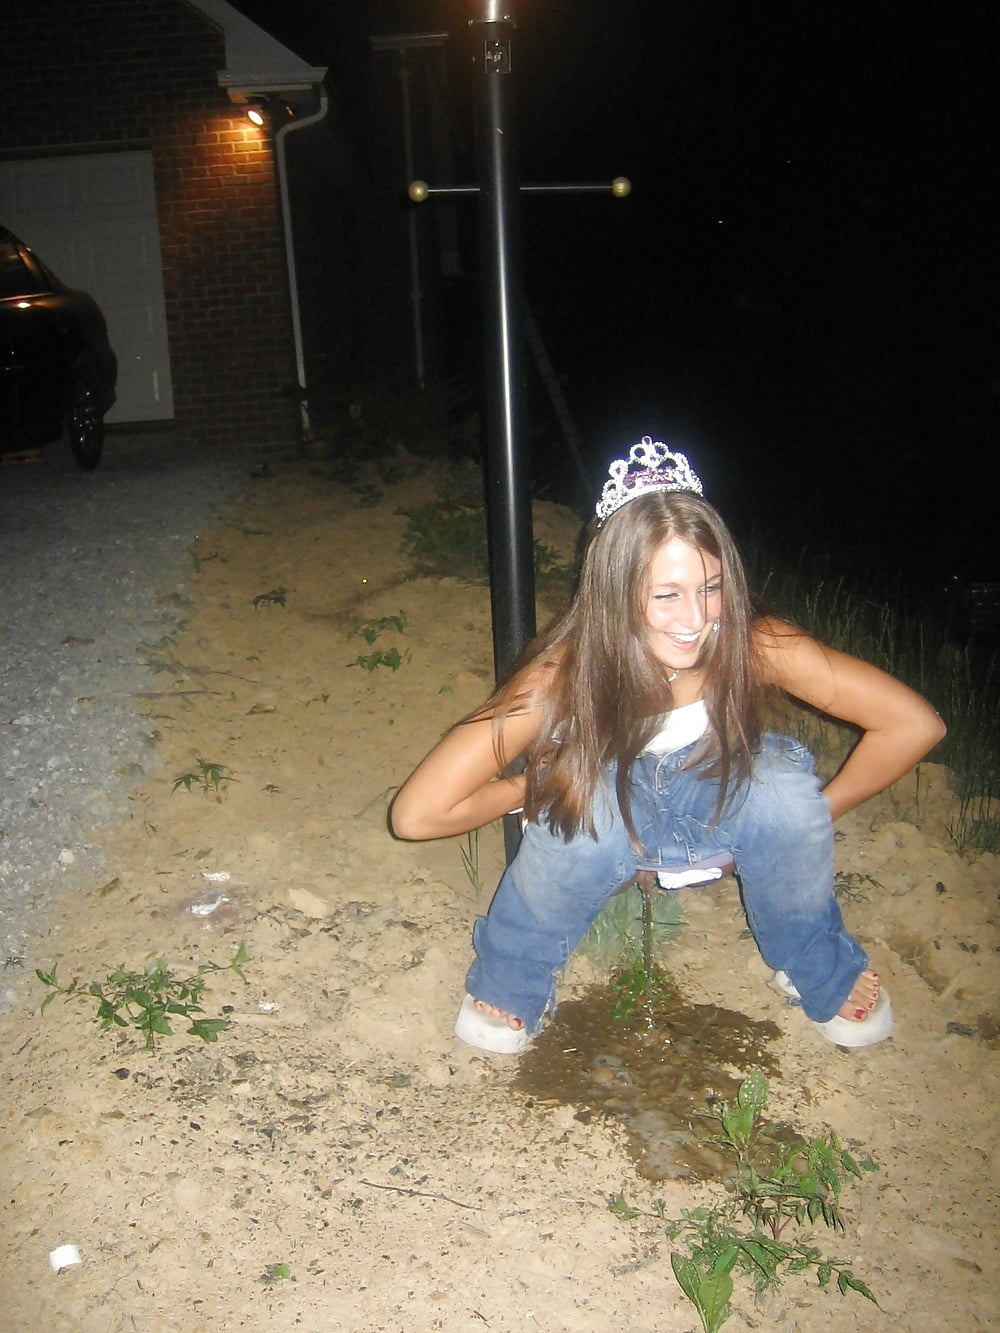 Girl pee public